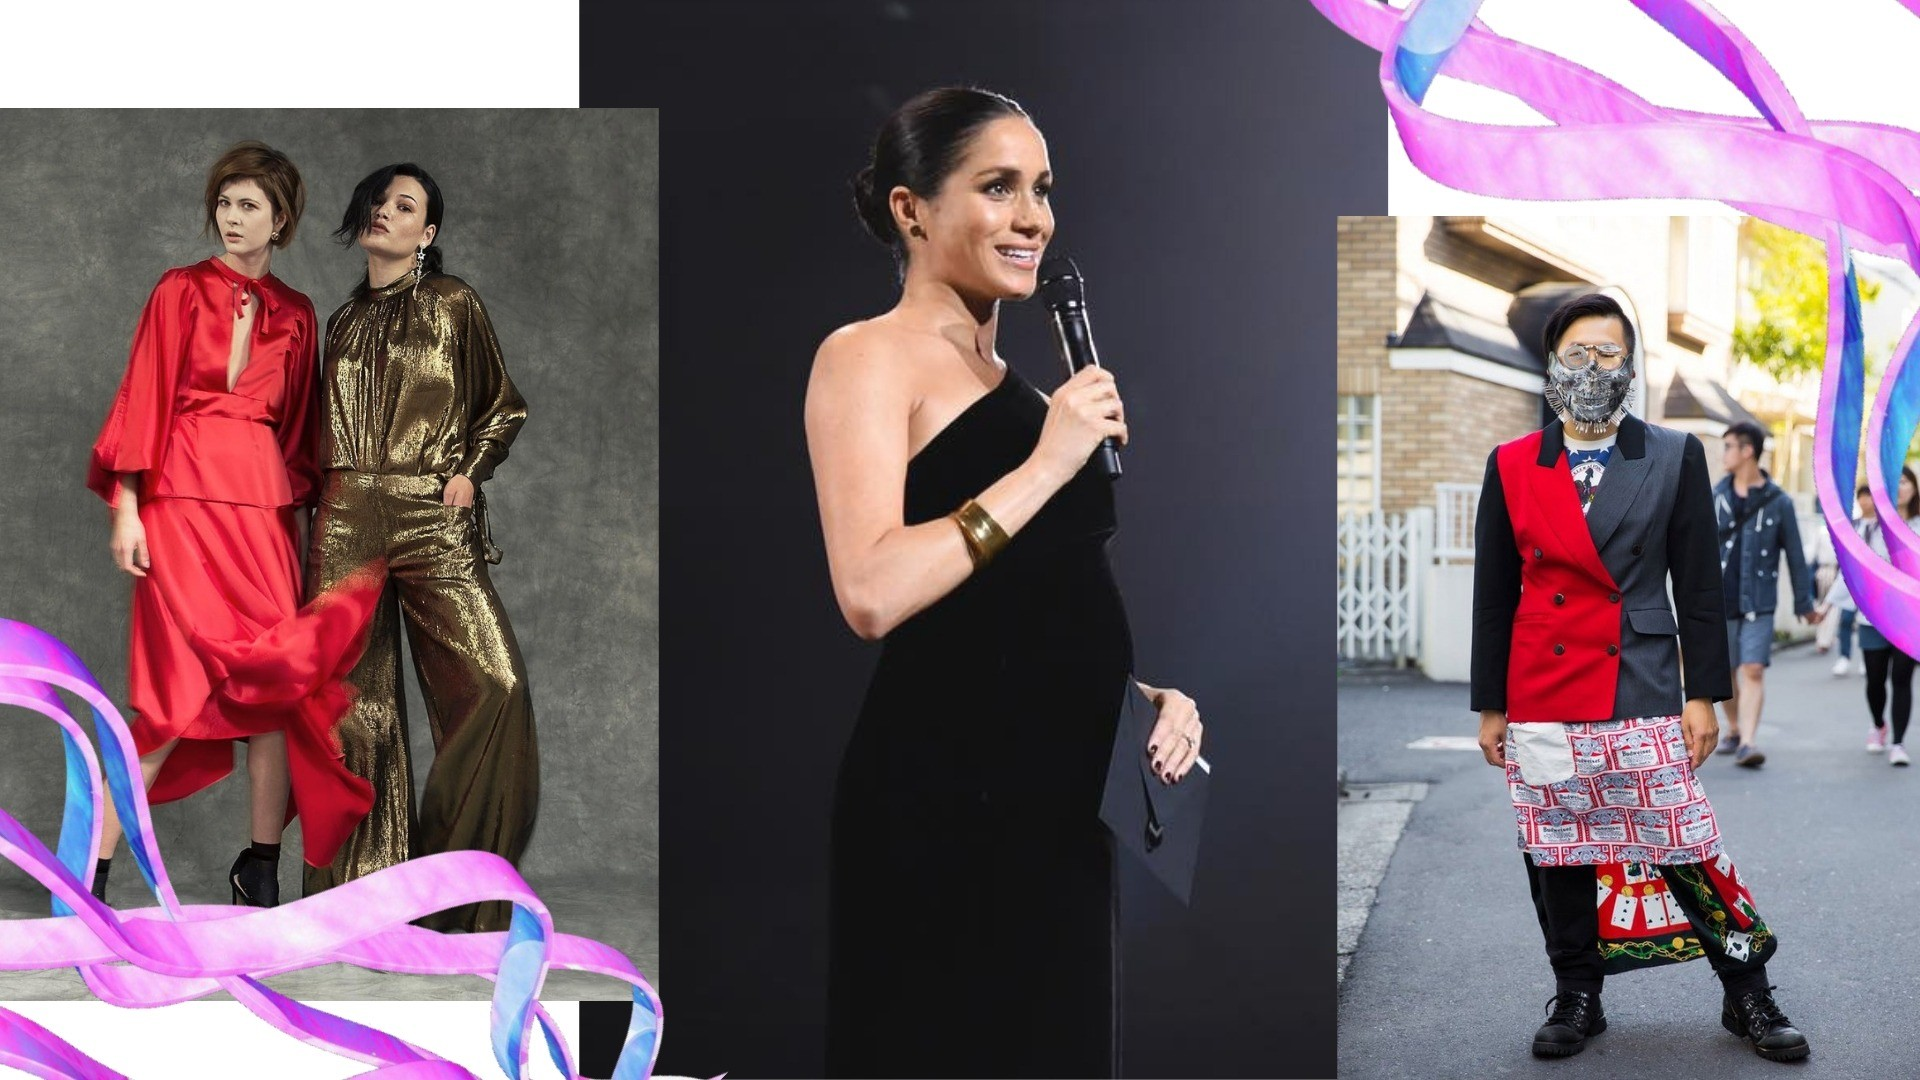 От 80-х до Меган Маркл и стиля харадзюку: топ модных трендов этого года